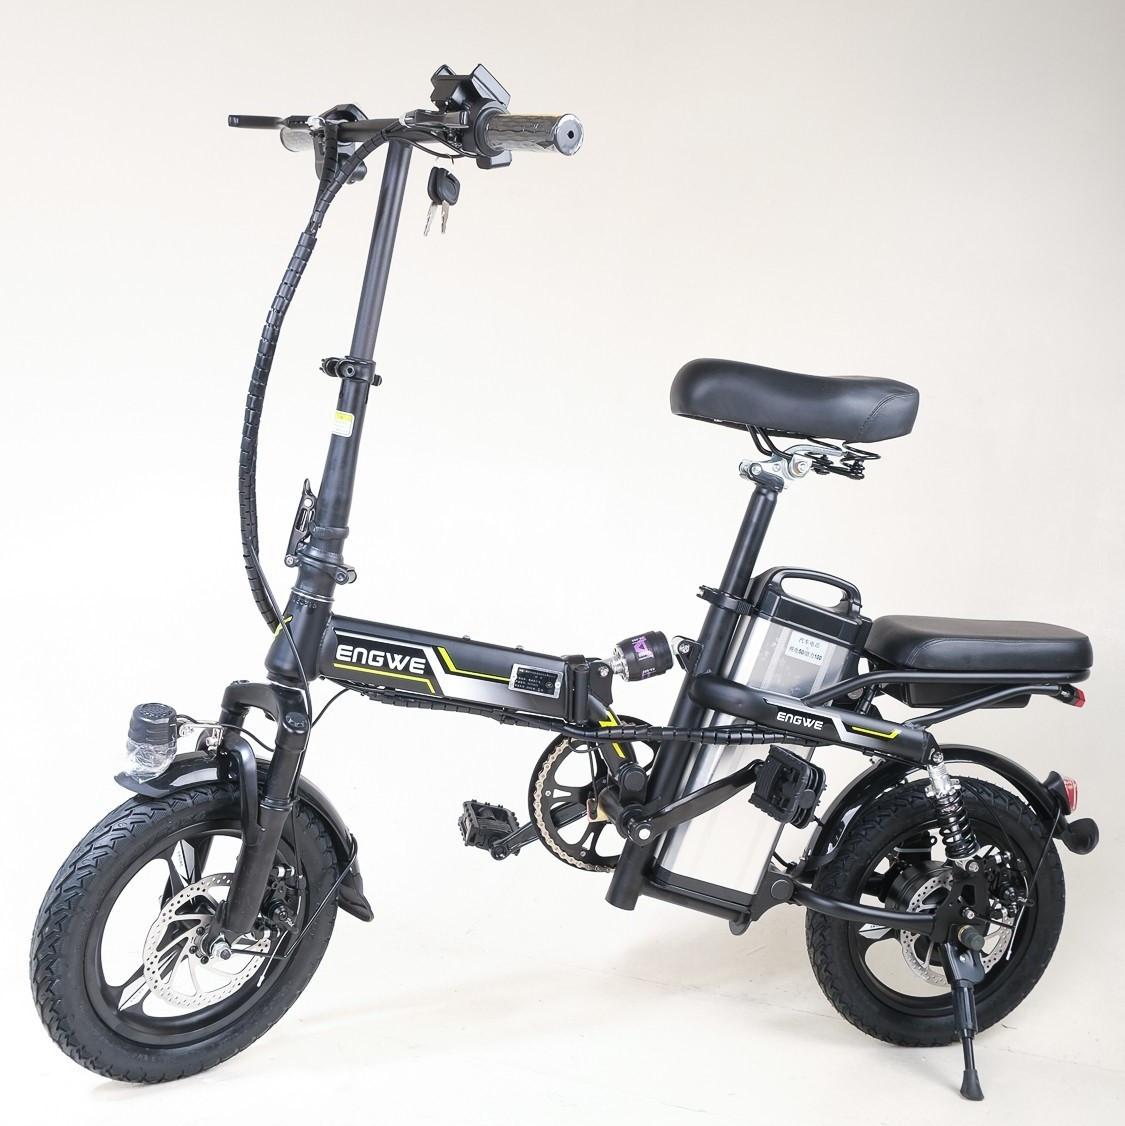 "Электровелосипед Energy CY 14""   электрический велосипед Энерджи складной со съемной батареей, сити-байк"